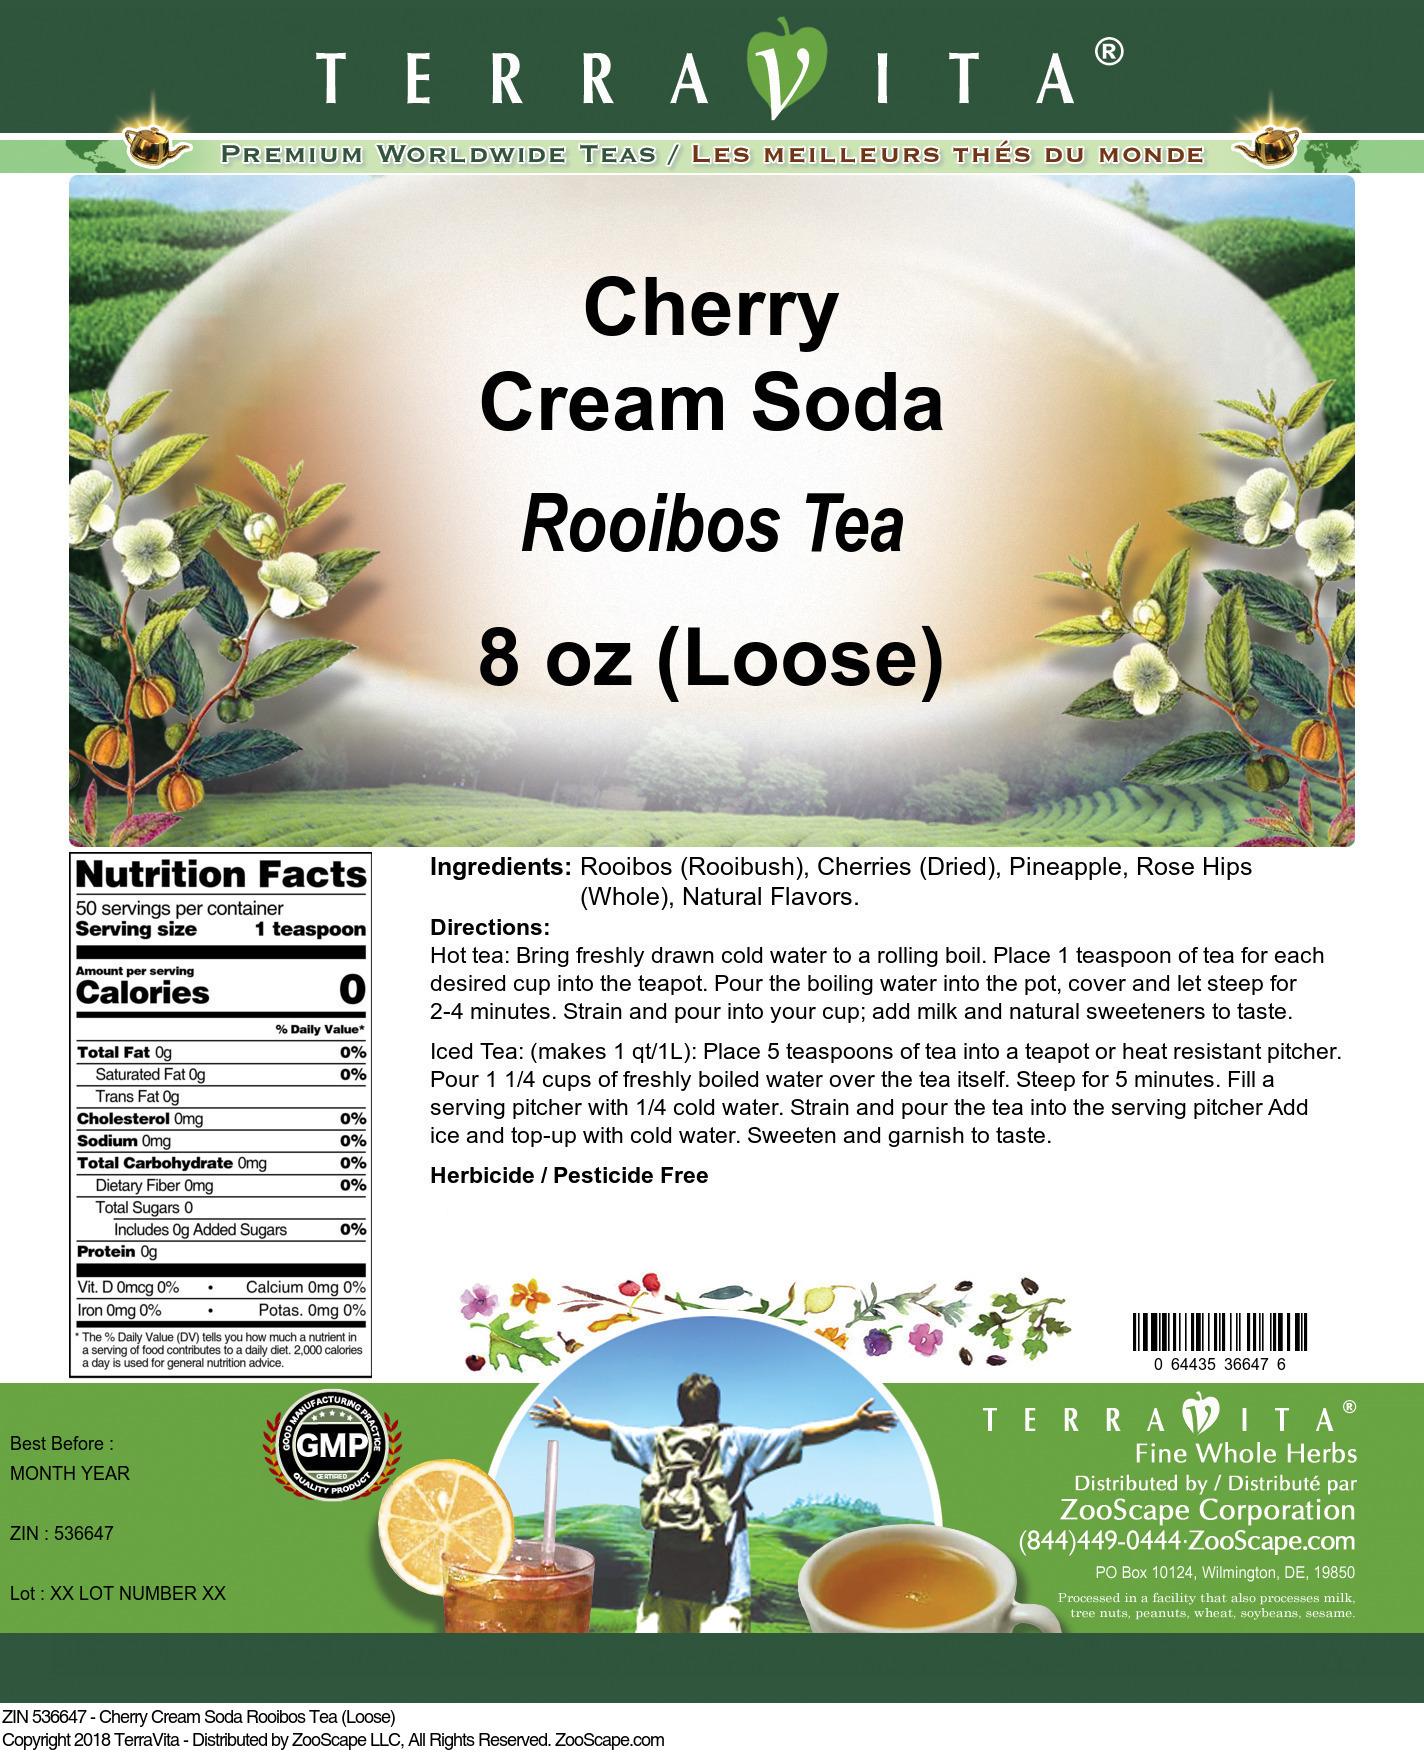 Cherry Cream Soda Rooibos Tea (Loose)